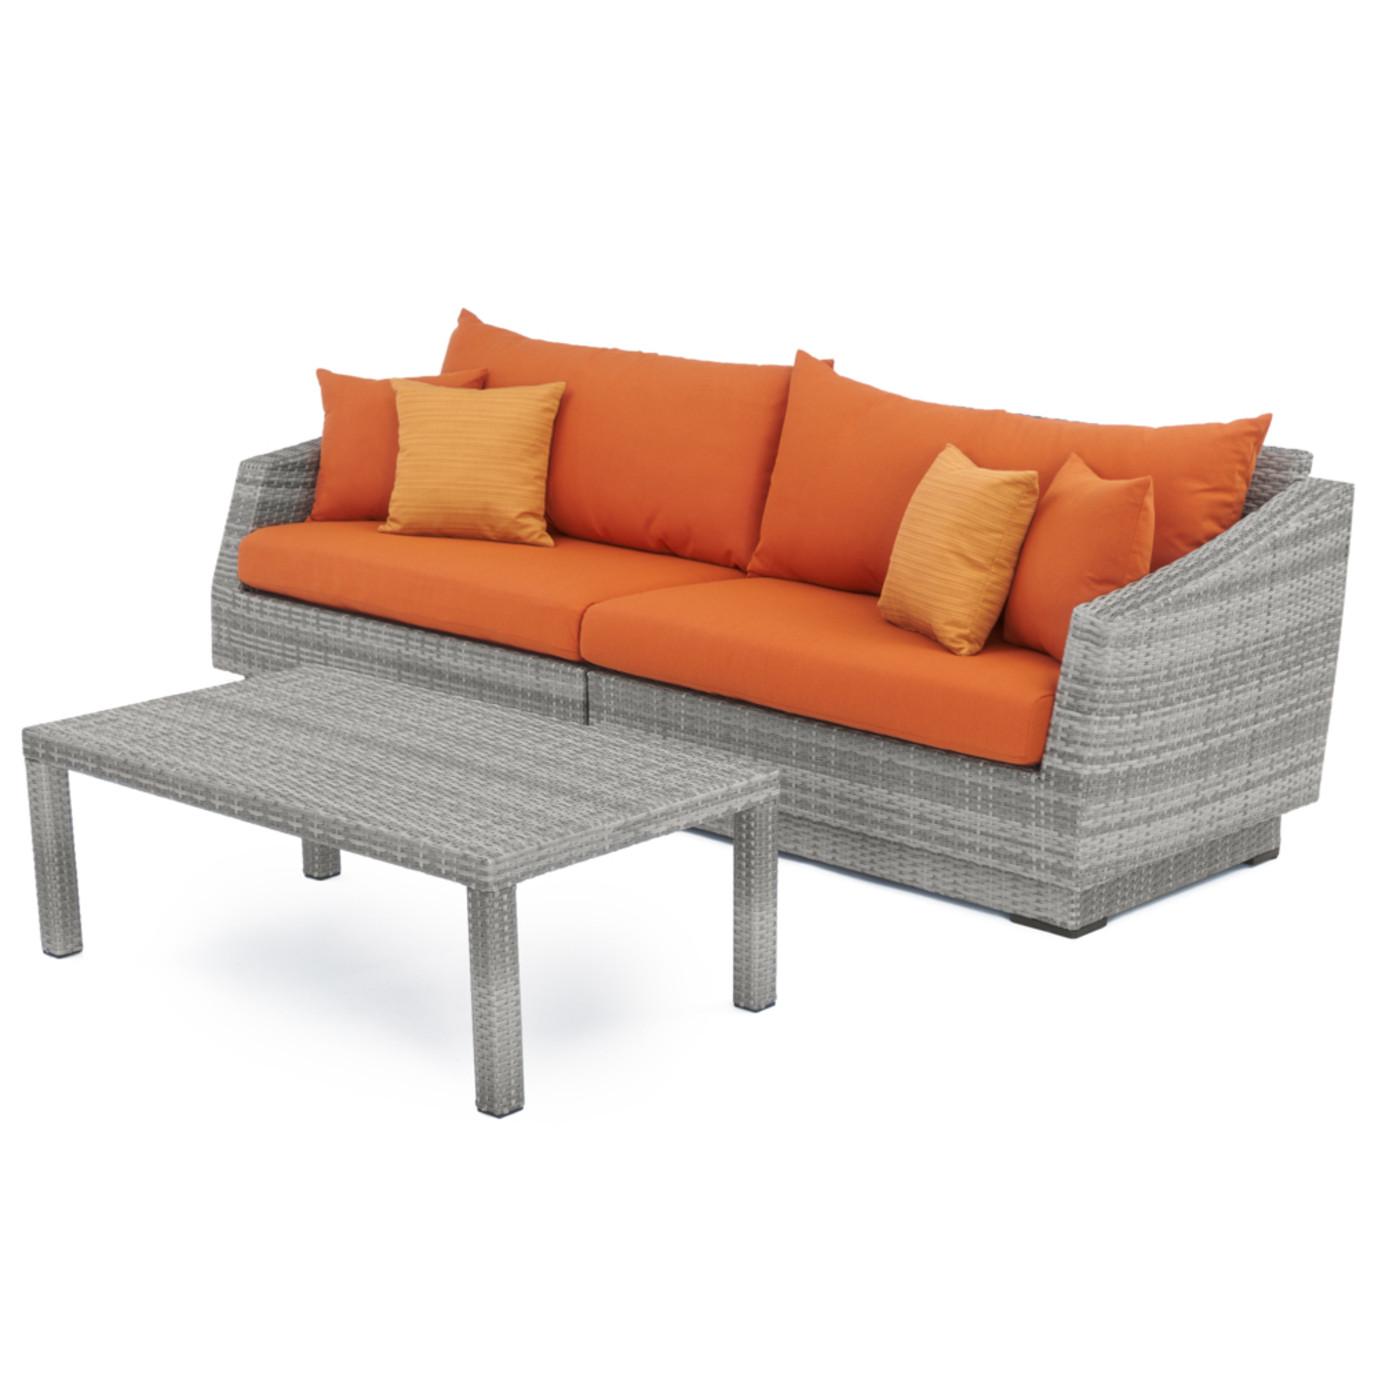 Cannes™ 20 Piece Outdoor Estate Set - Tikka Orange